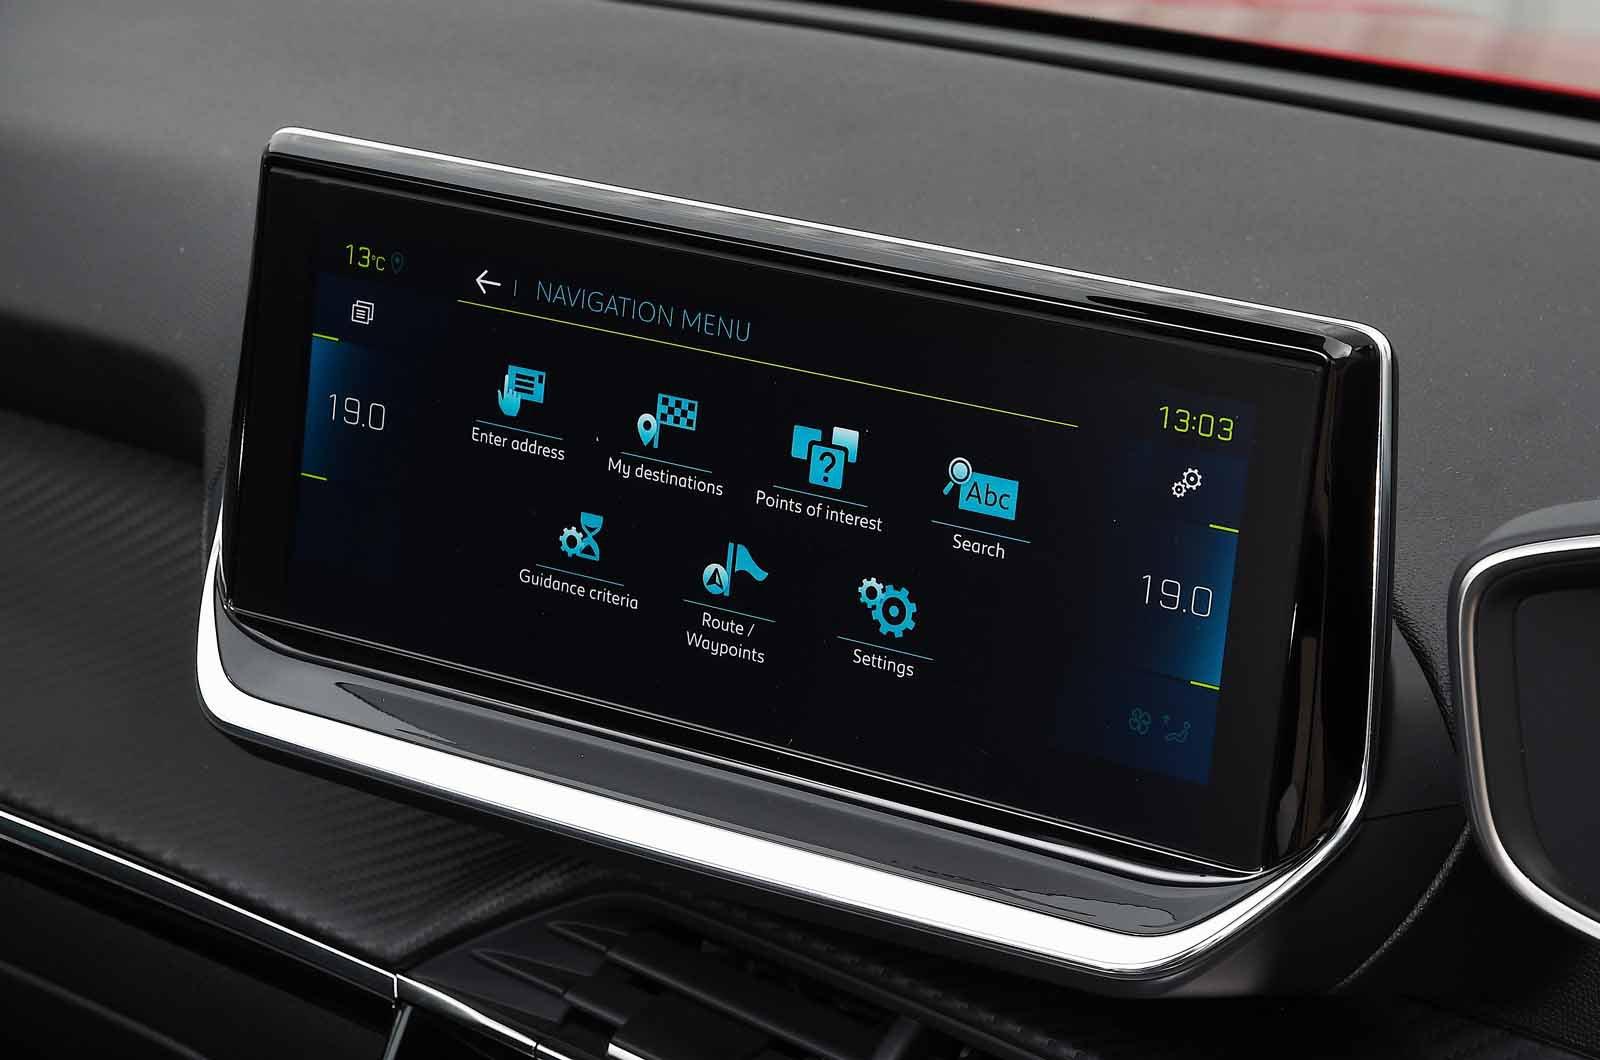 Peugeot e-208 2021 touchscreen